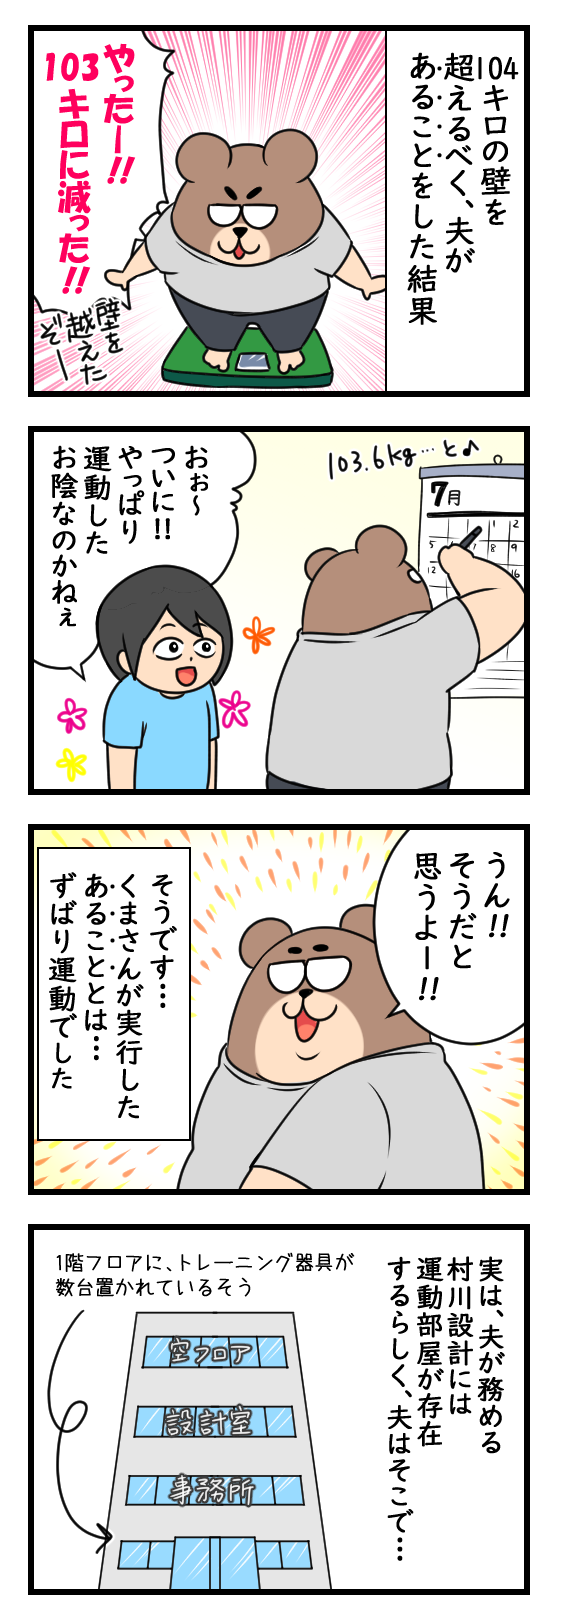 014_1